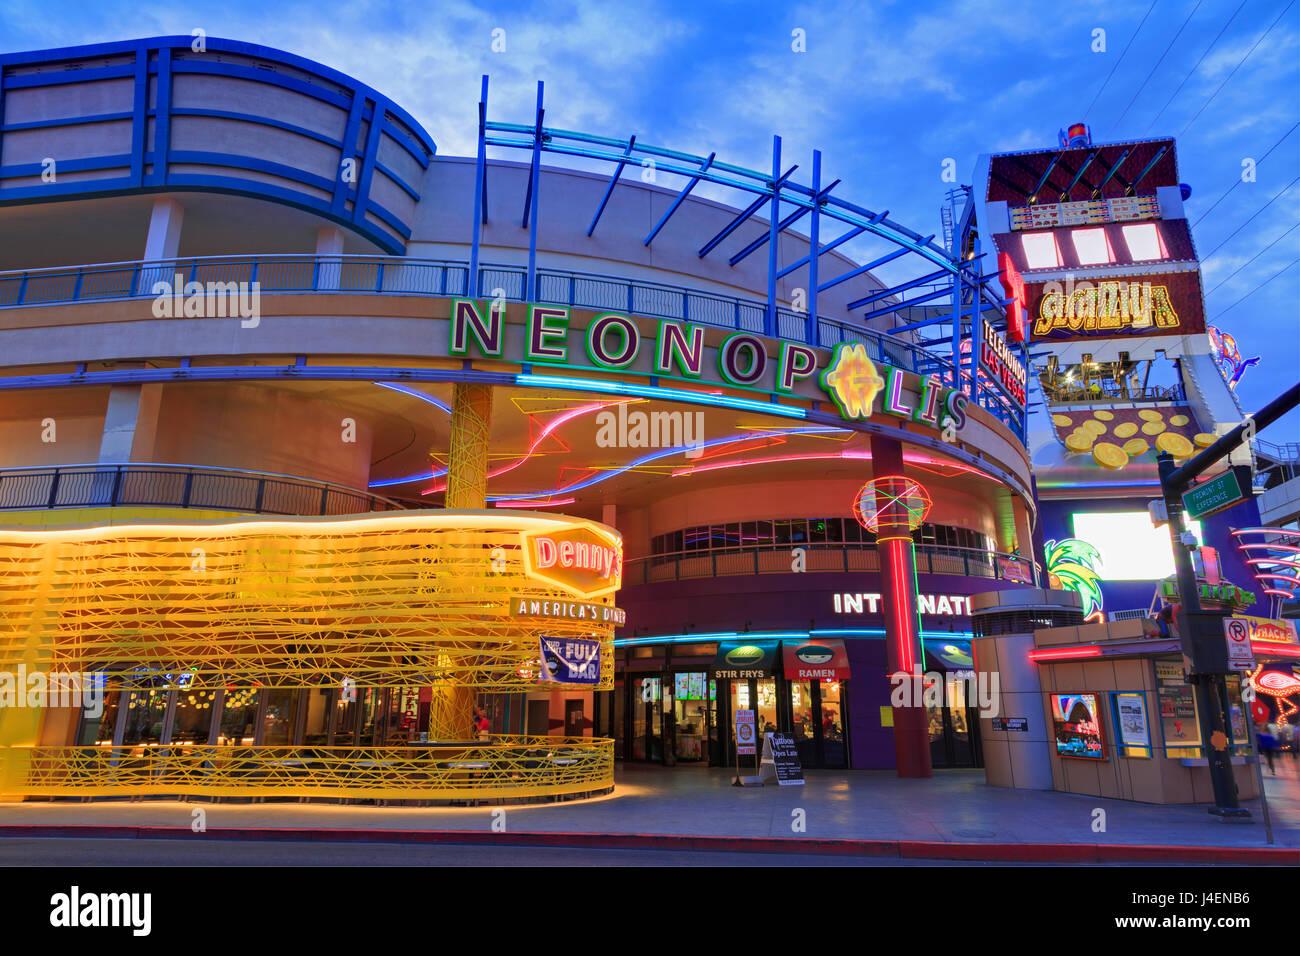 Neonopolis, Fremont Street, Las Vegas, Nevada, Vereinigte Staaten von Amerika, Nordamerika Stockbild